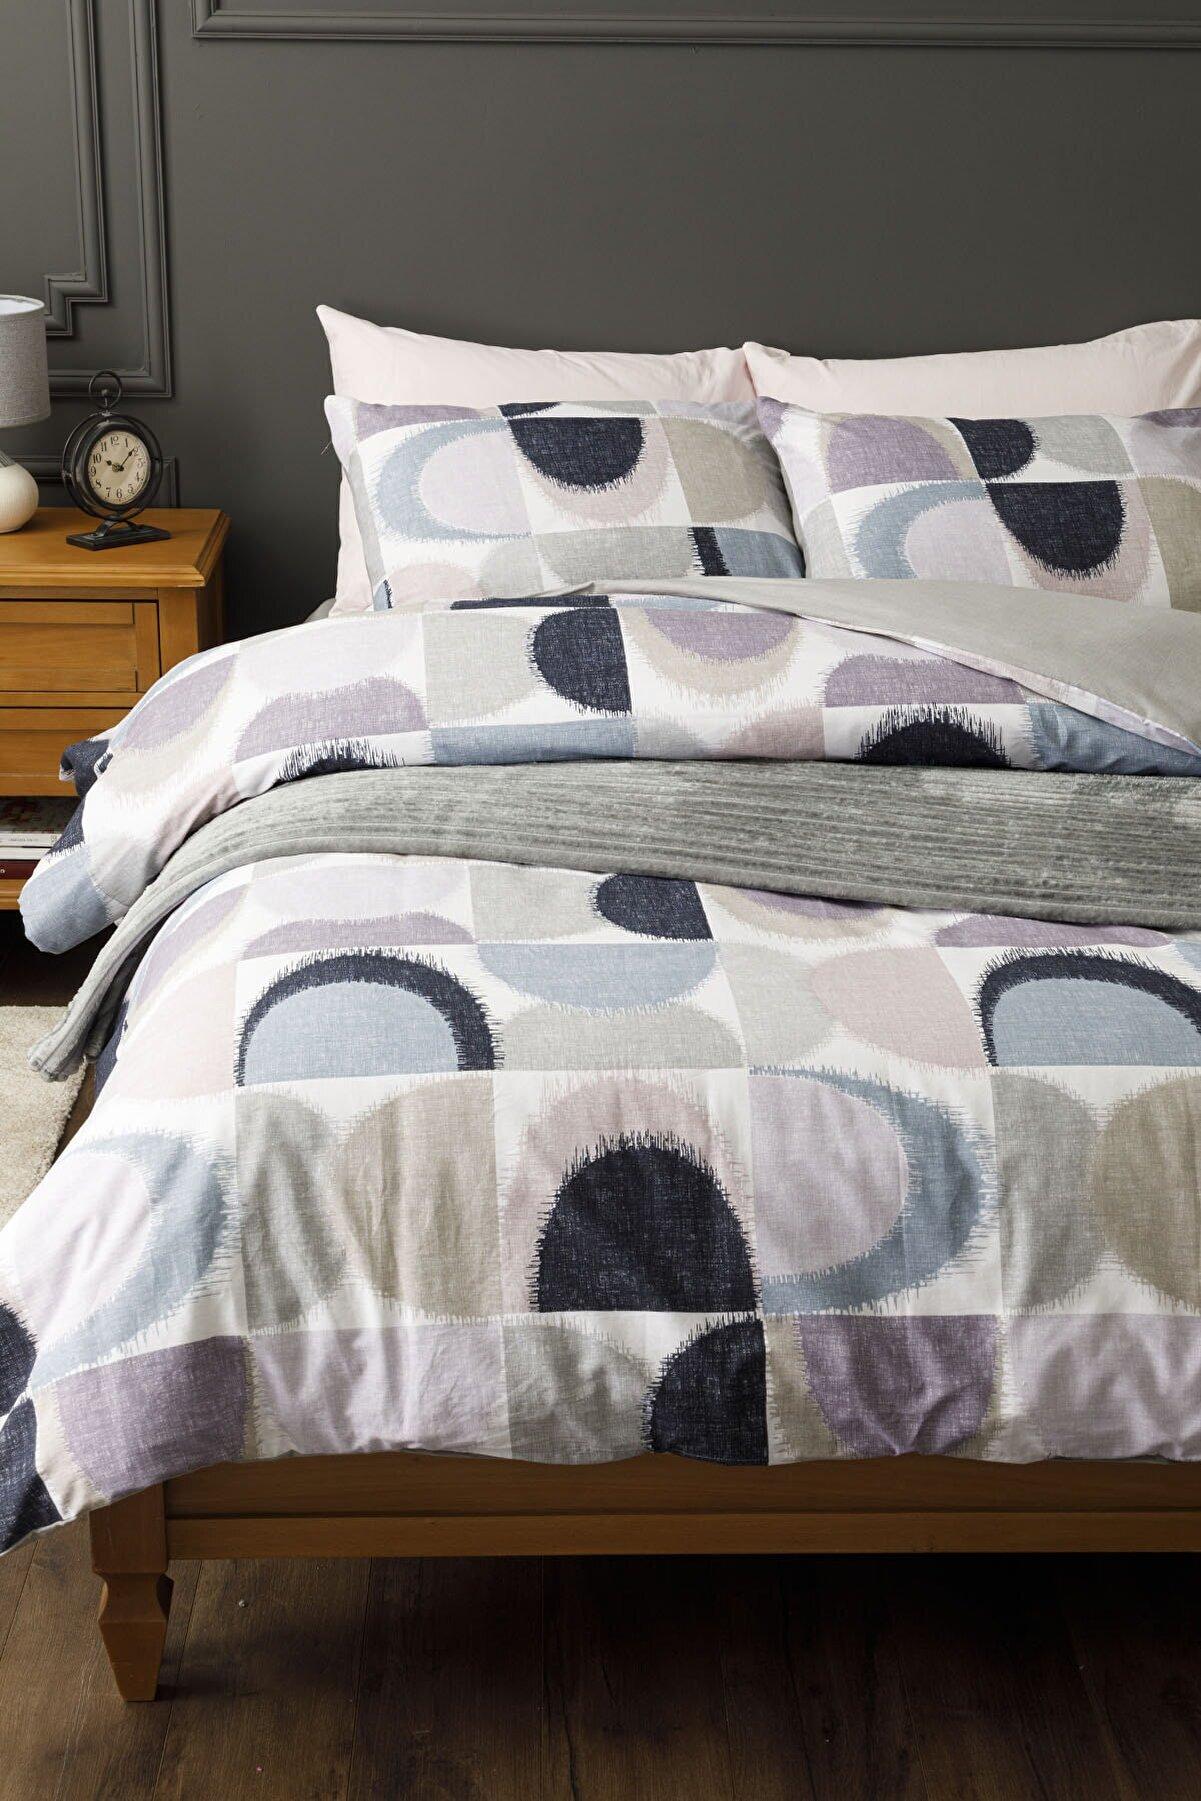 English Home Abstract Pamuk King Size Nevresim Takımı 240x220 Cm Mavi-lila